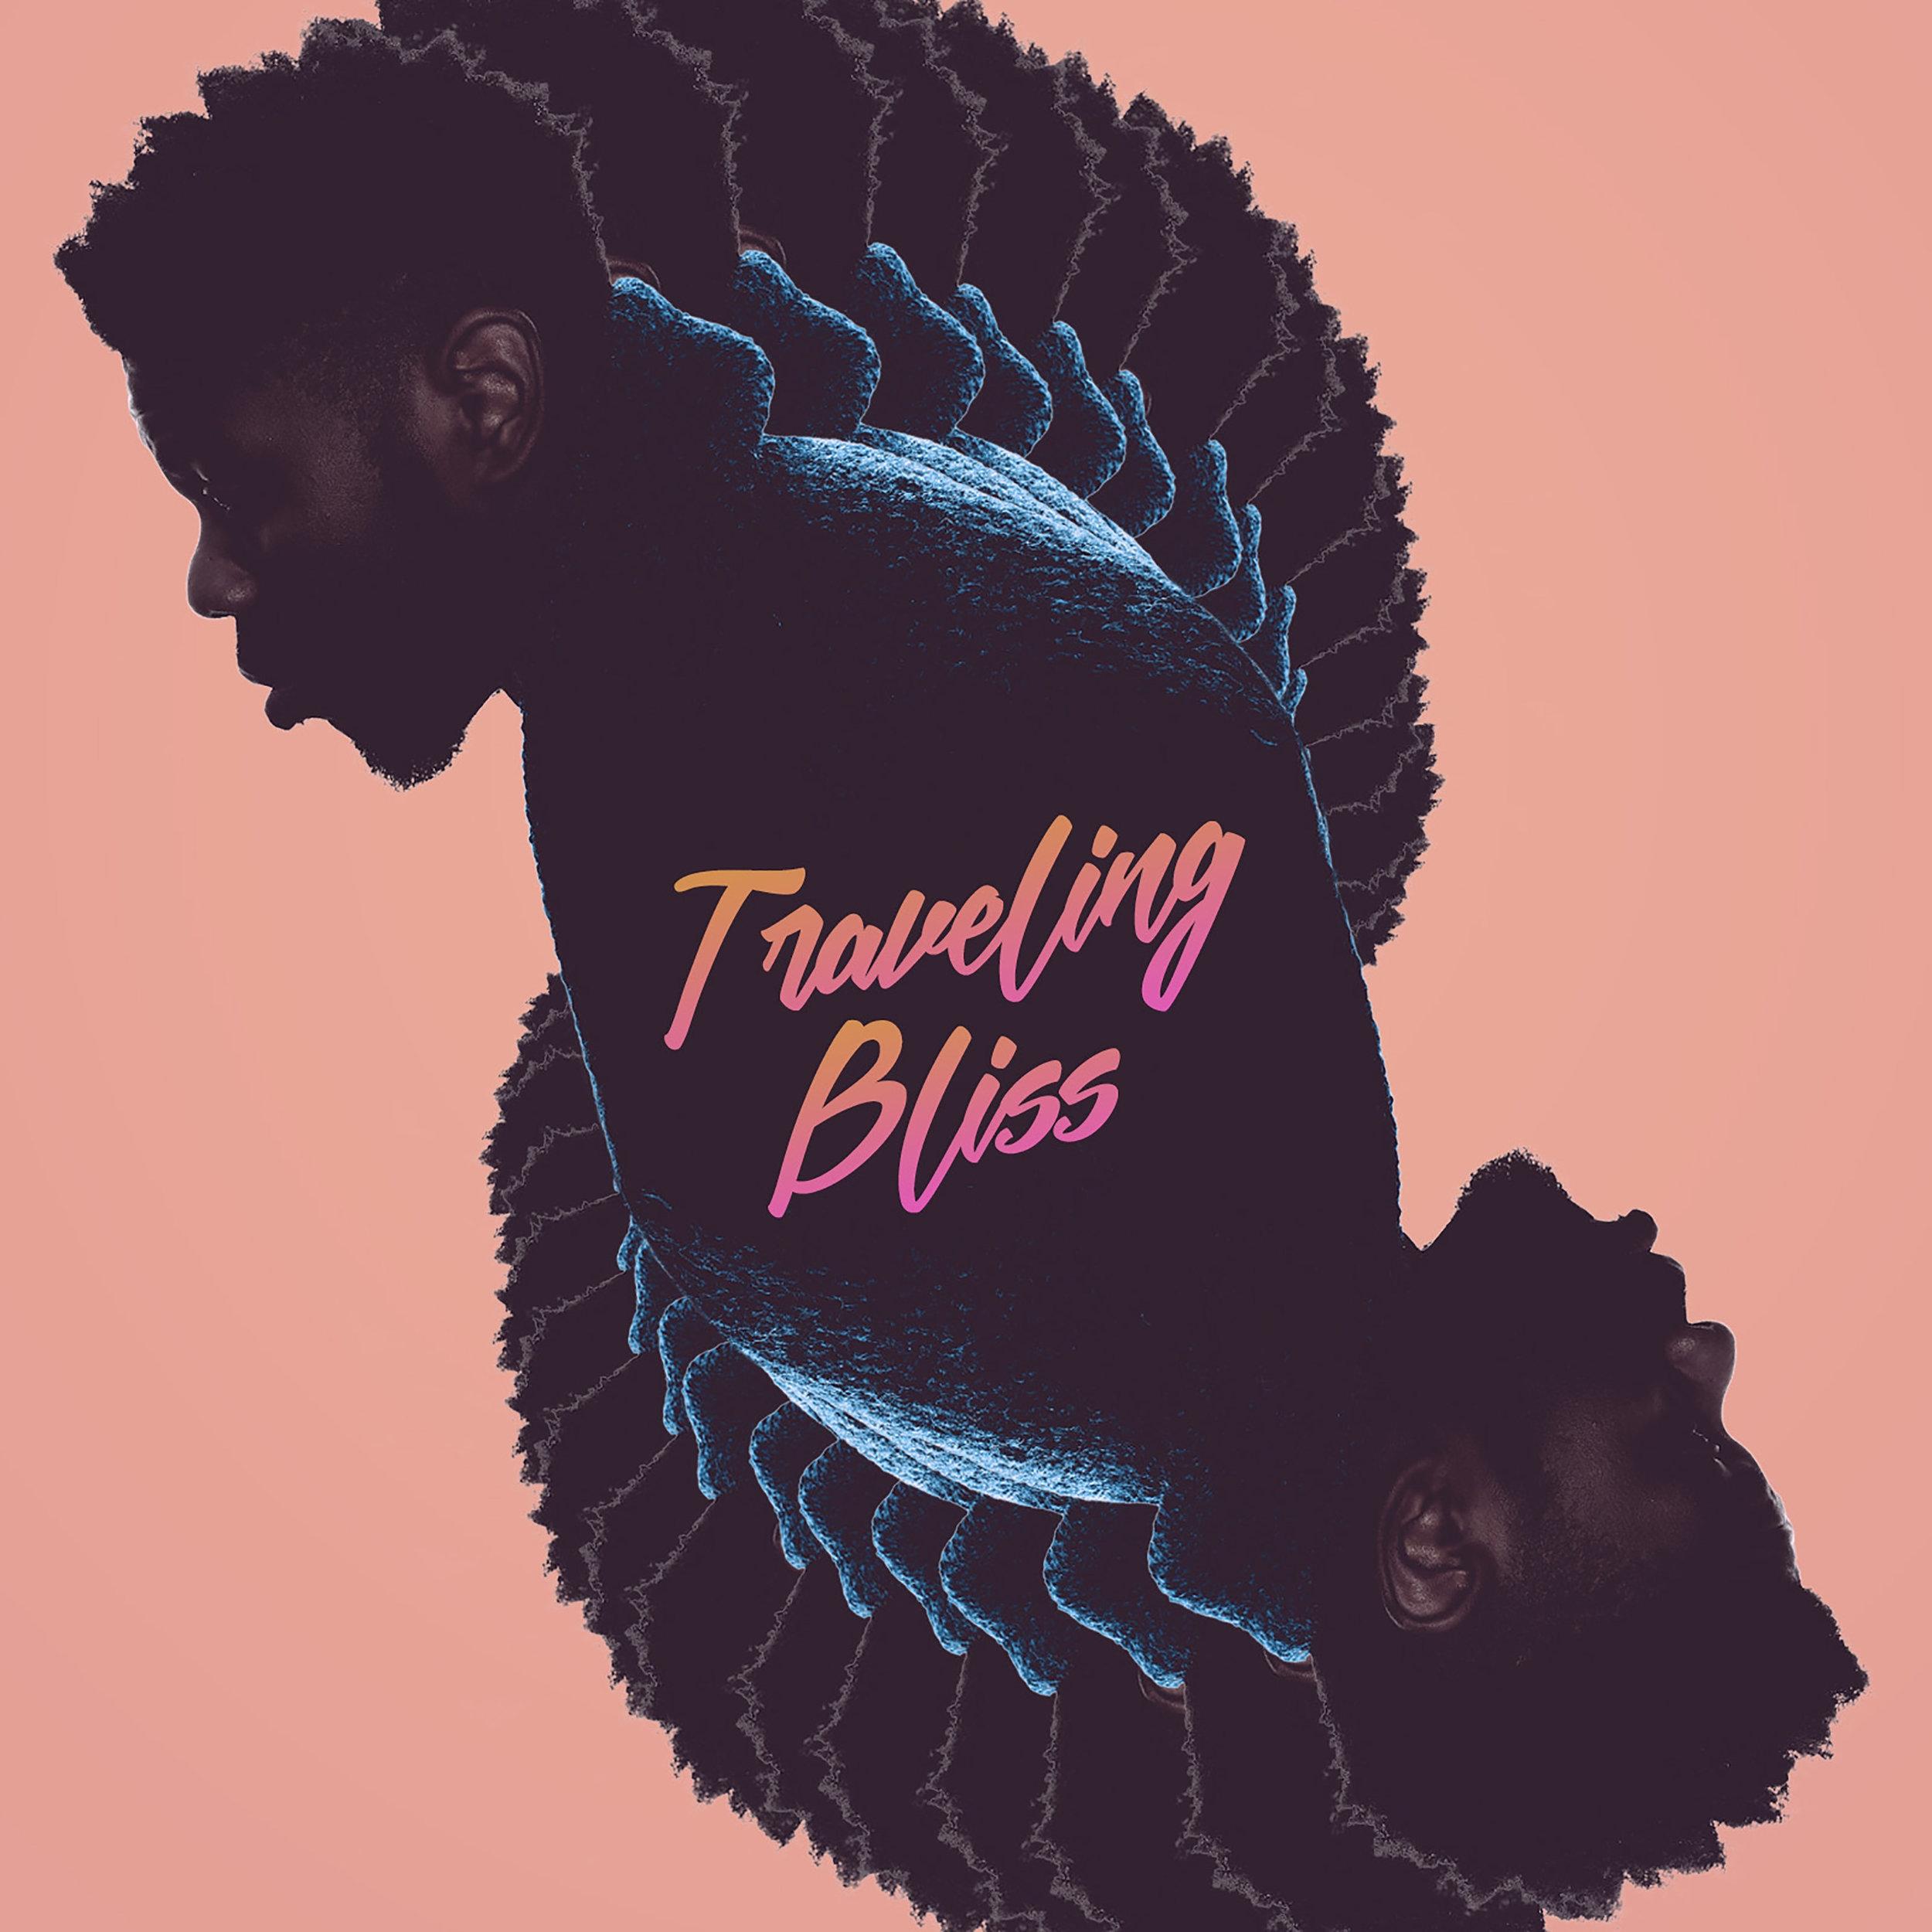 Traveling Bliss_Fin4_3000x3000.jpg